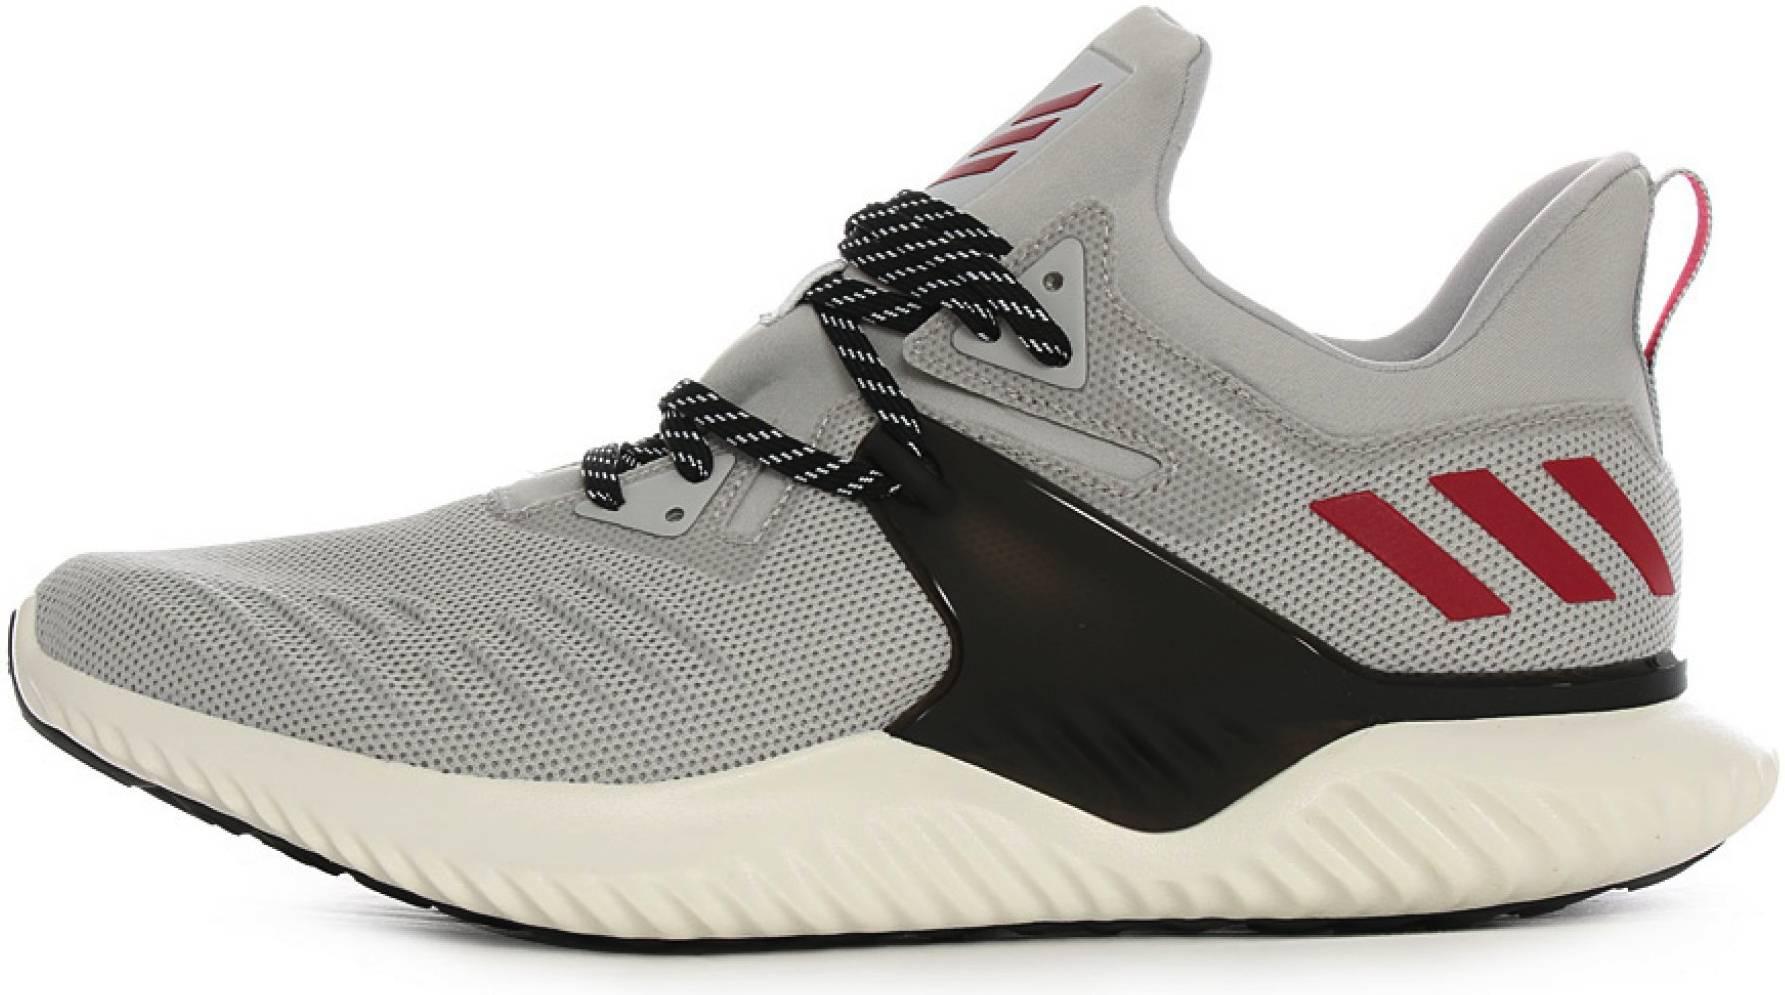 Adidas Alphabounce Beyond 2.0